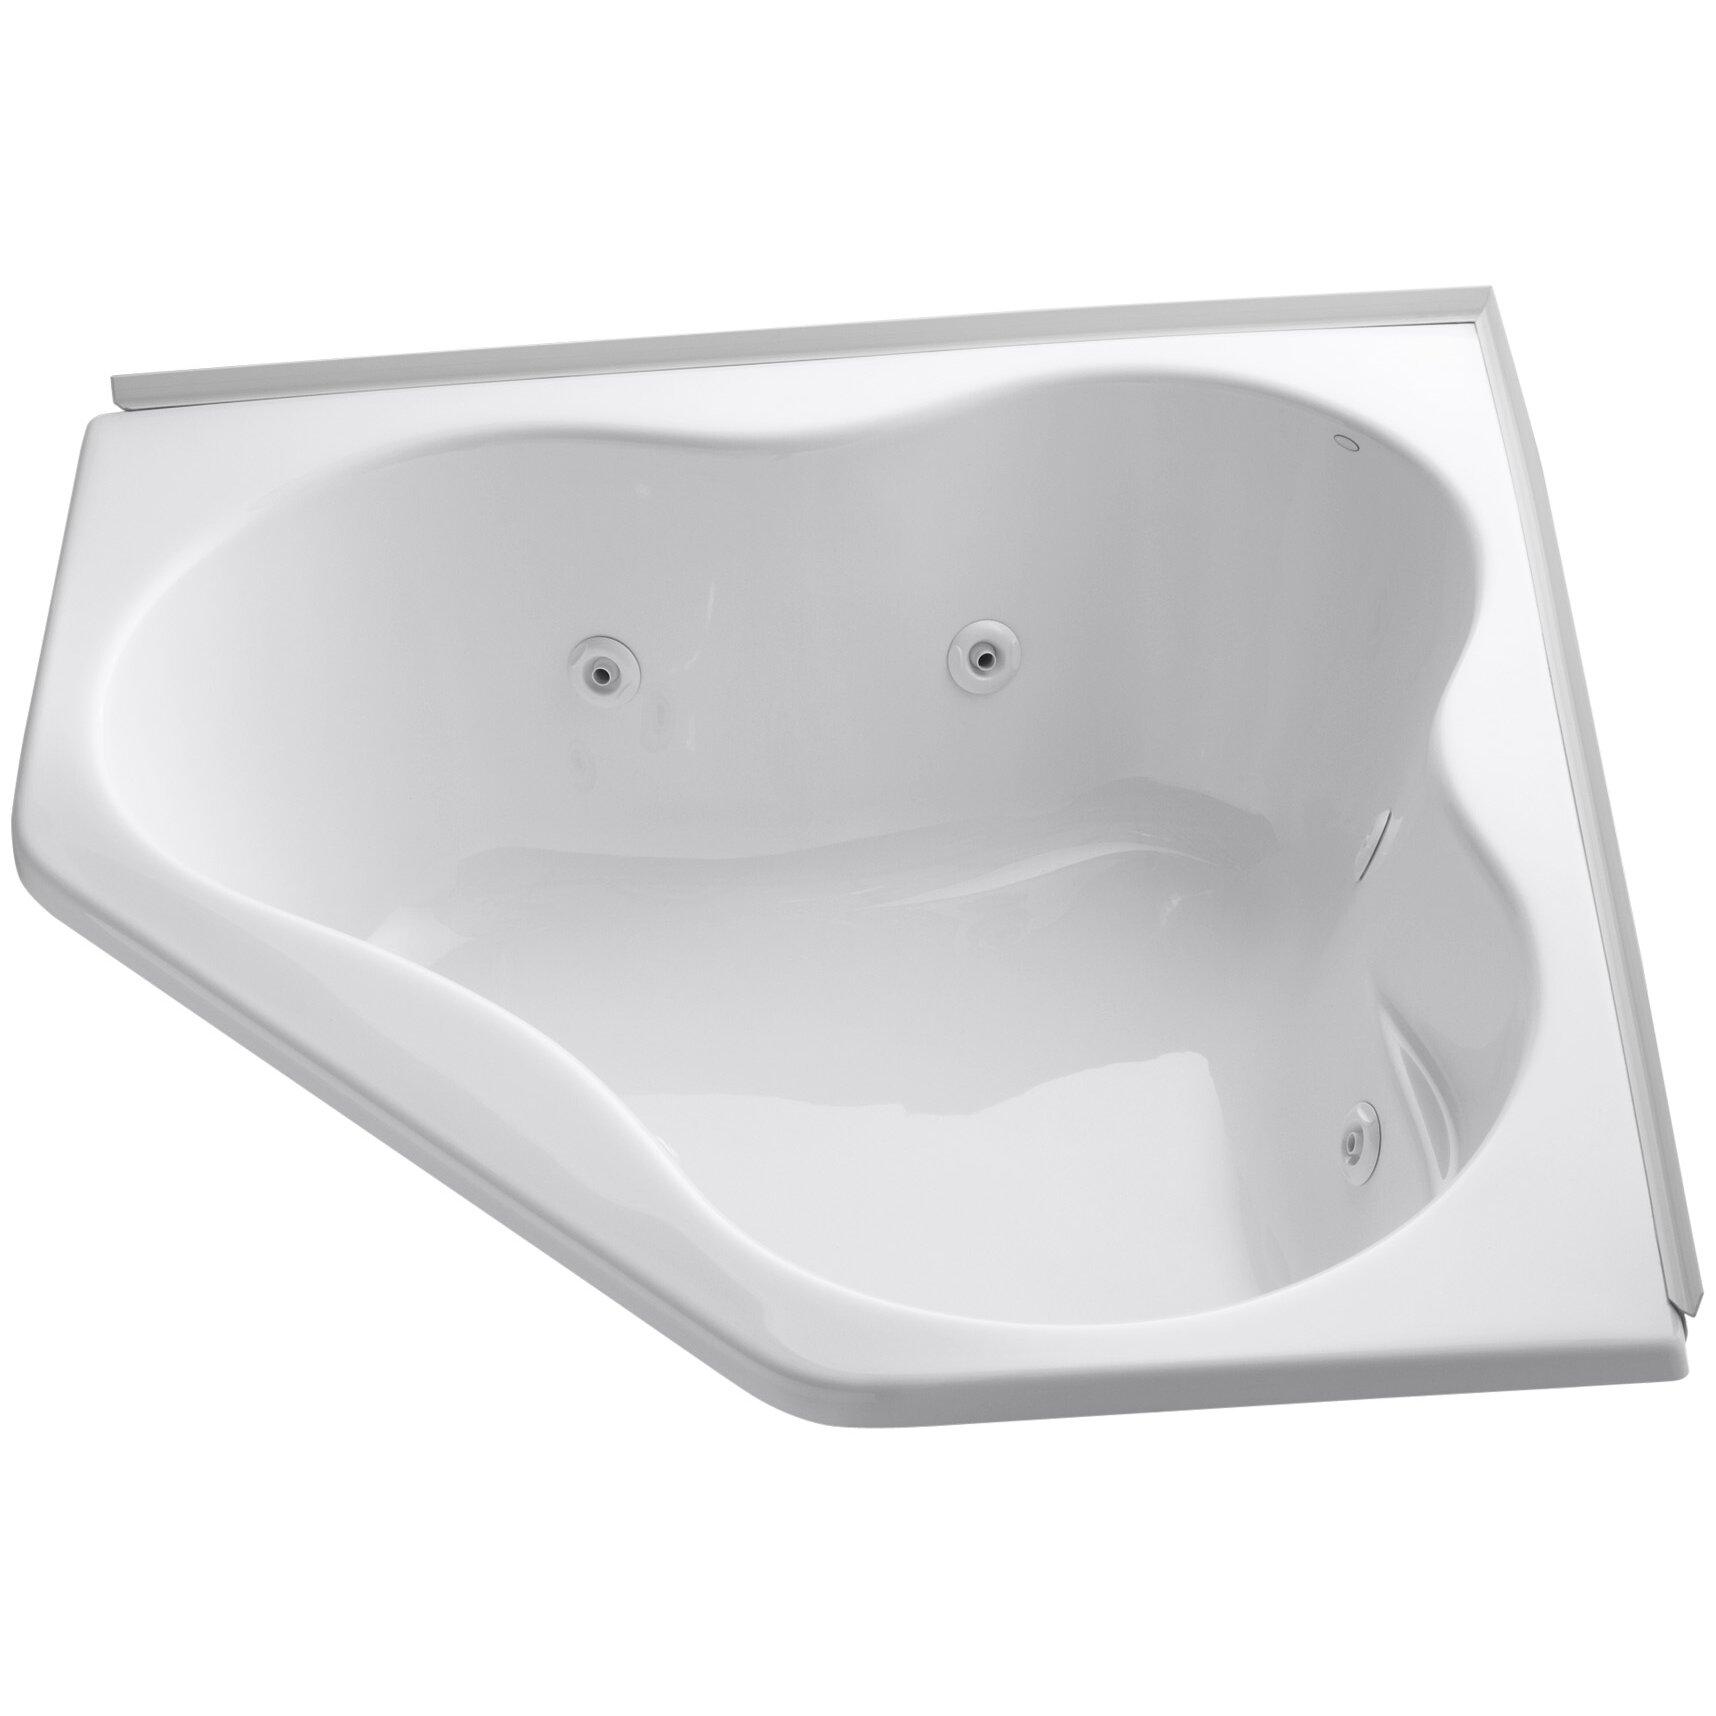 Corner Bathtub 54 X 54 Images - Reverse Search